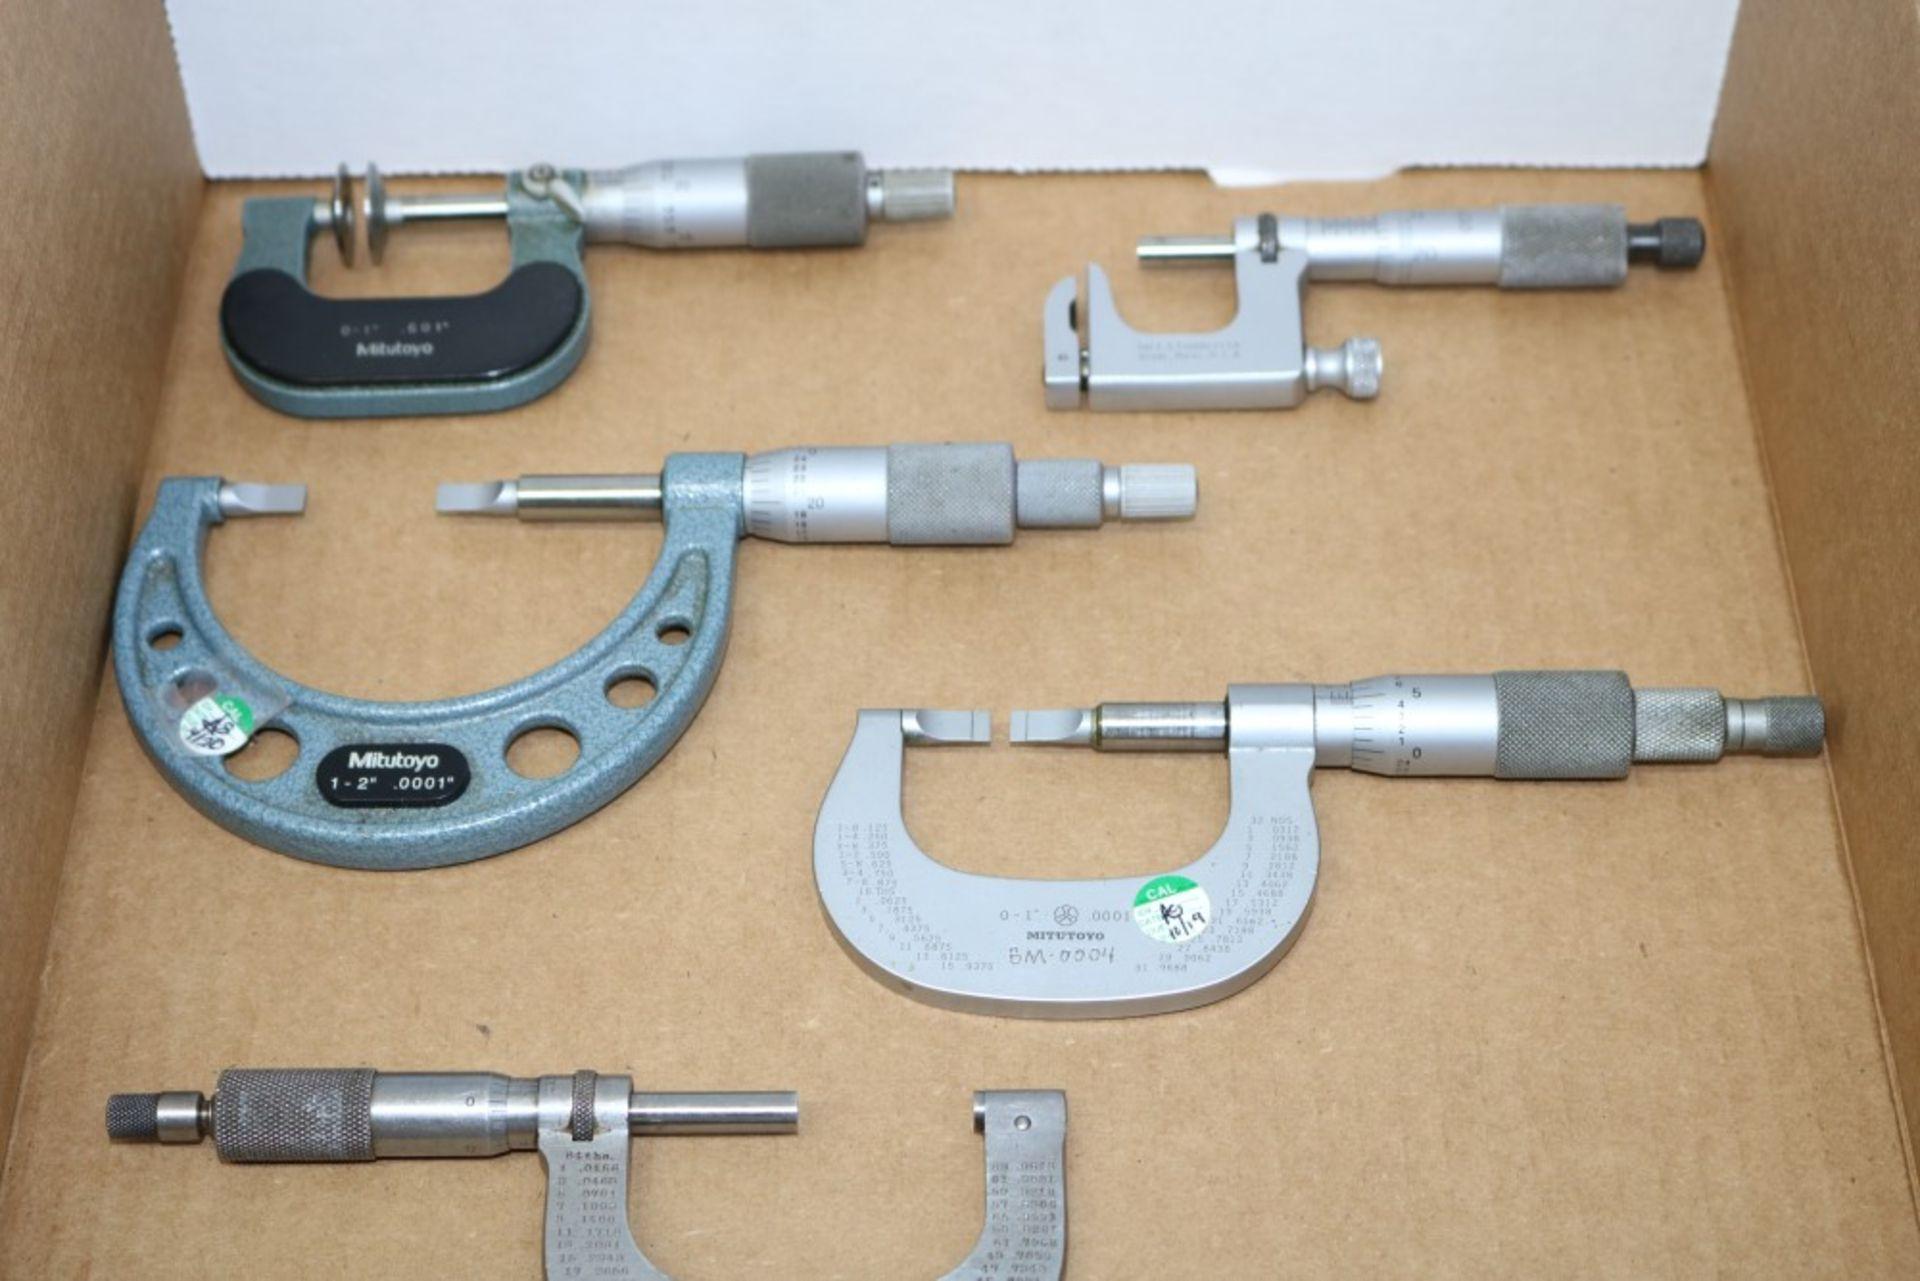 "Lot 9 - Mitutoyo 0-1"", 1-2"" Blade Micrometer, Mitutoyo 0-1"" Pan Micrometer, Brown & Sharpe 1-2"" Od"